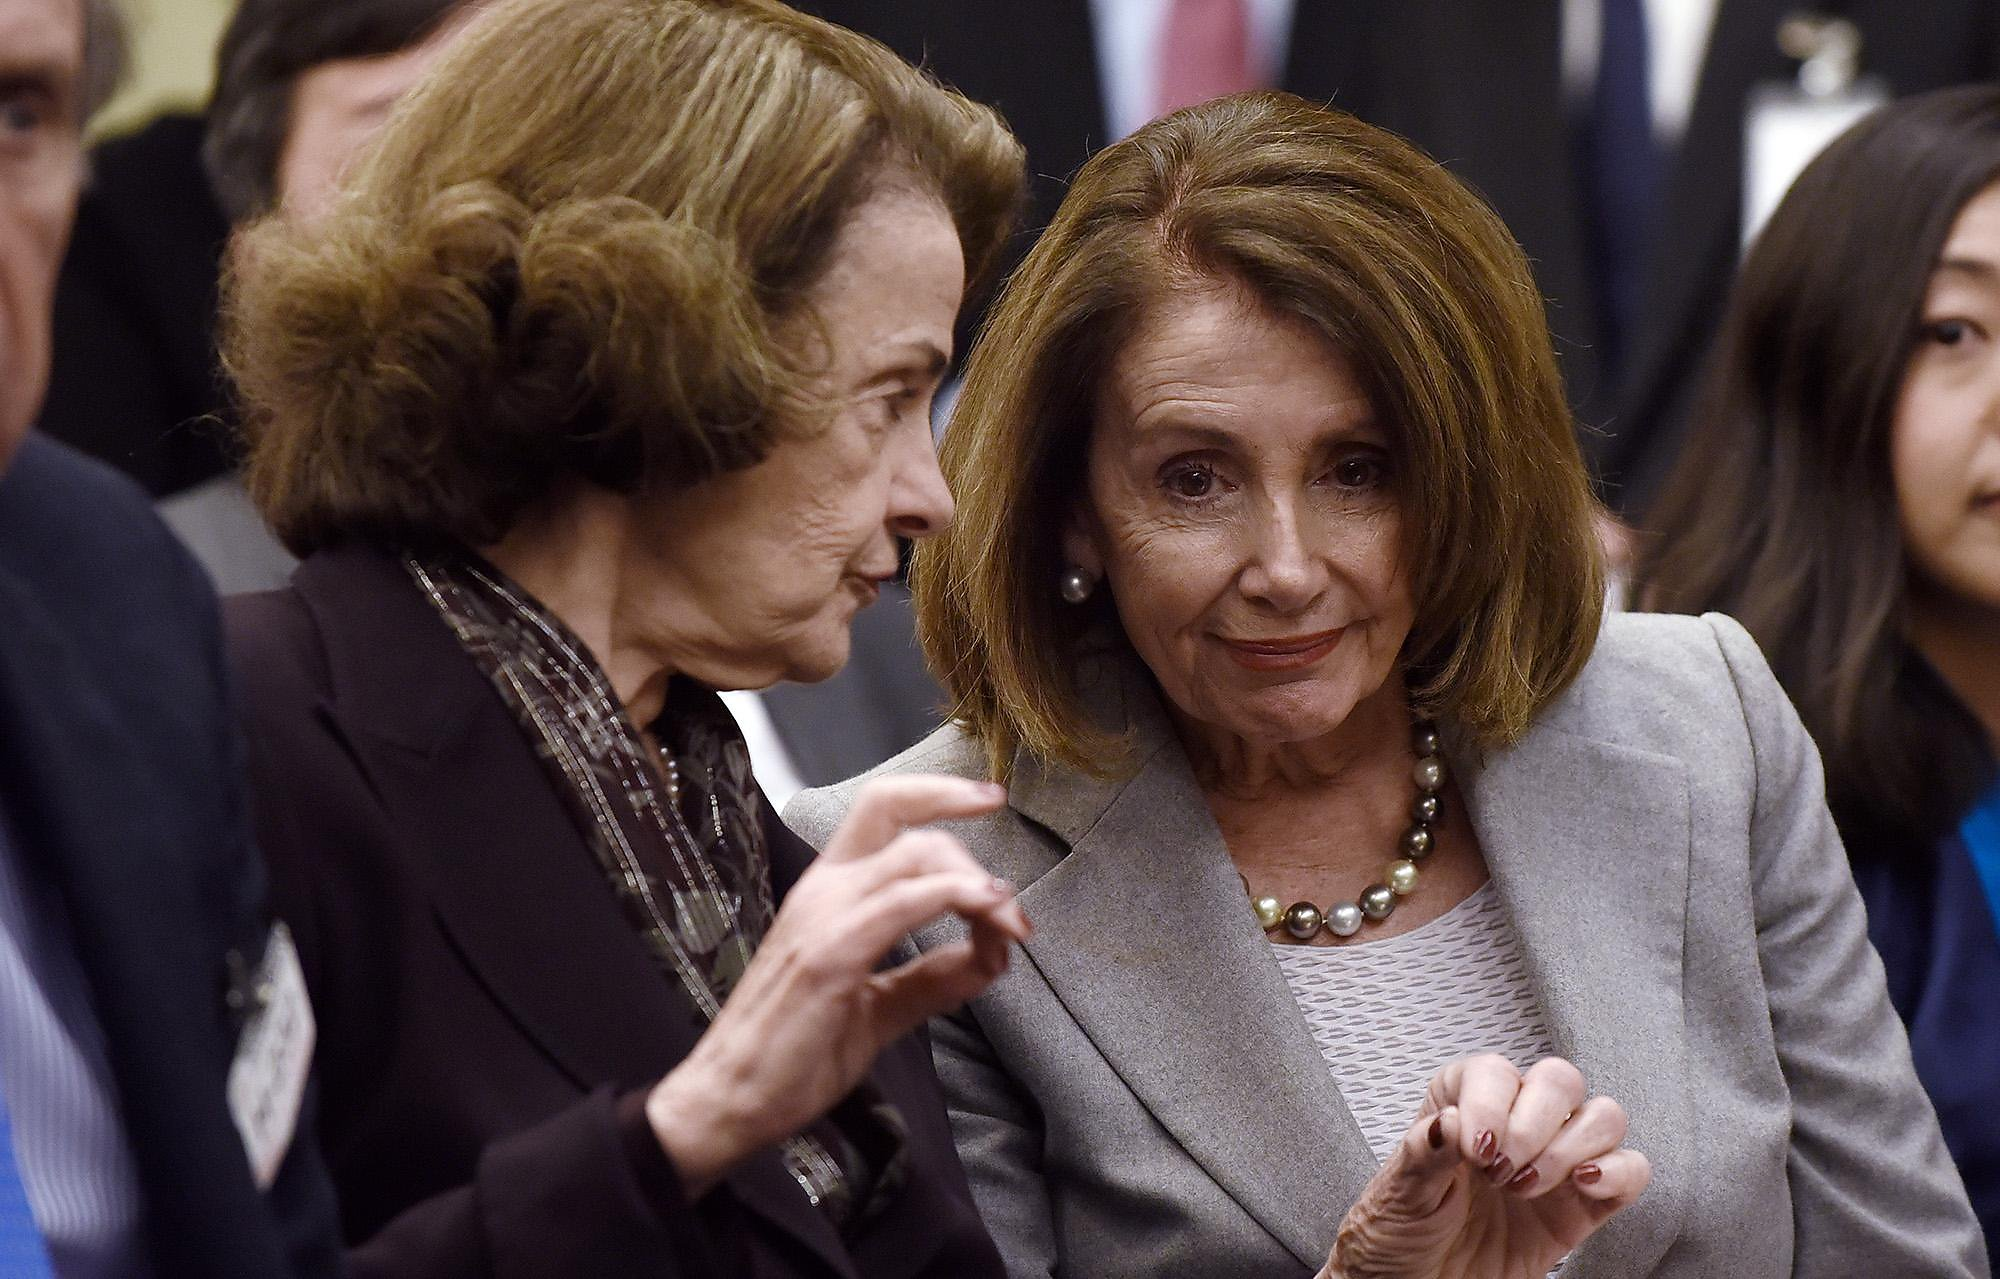 dianne feinstein calls on nancy pelosi to send articles of impeachment to senate dianne feinstein calls on nancy pelosi